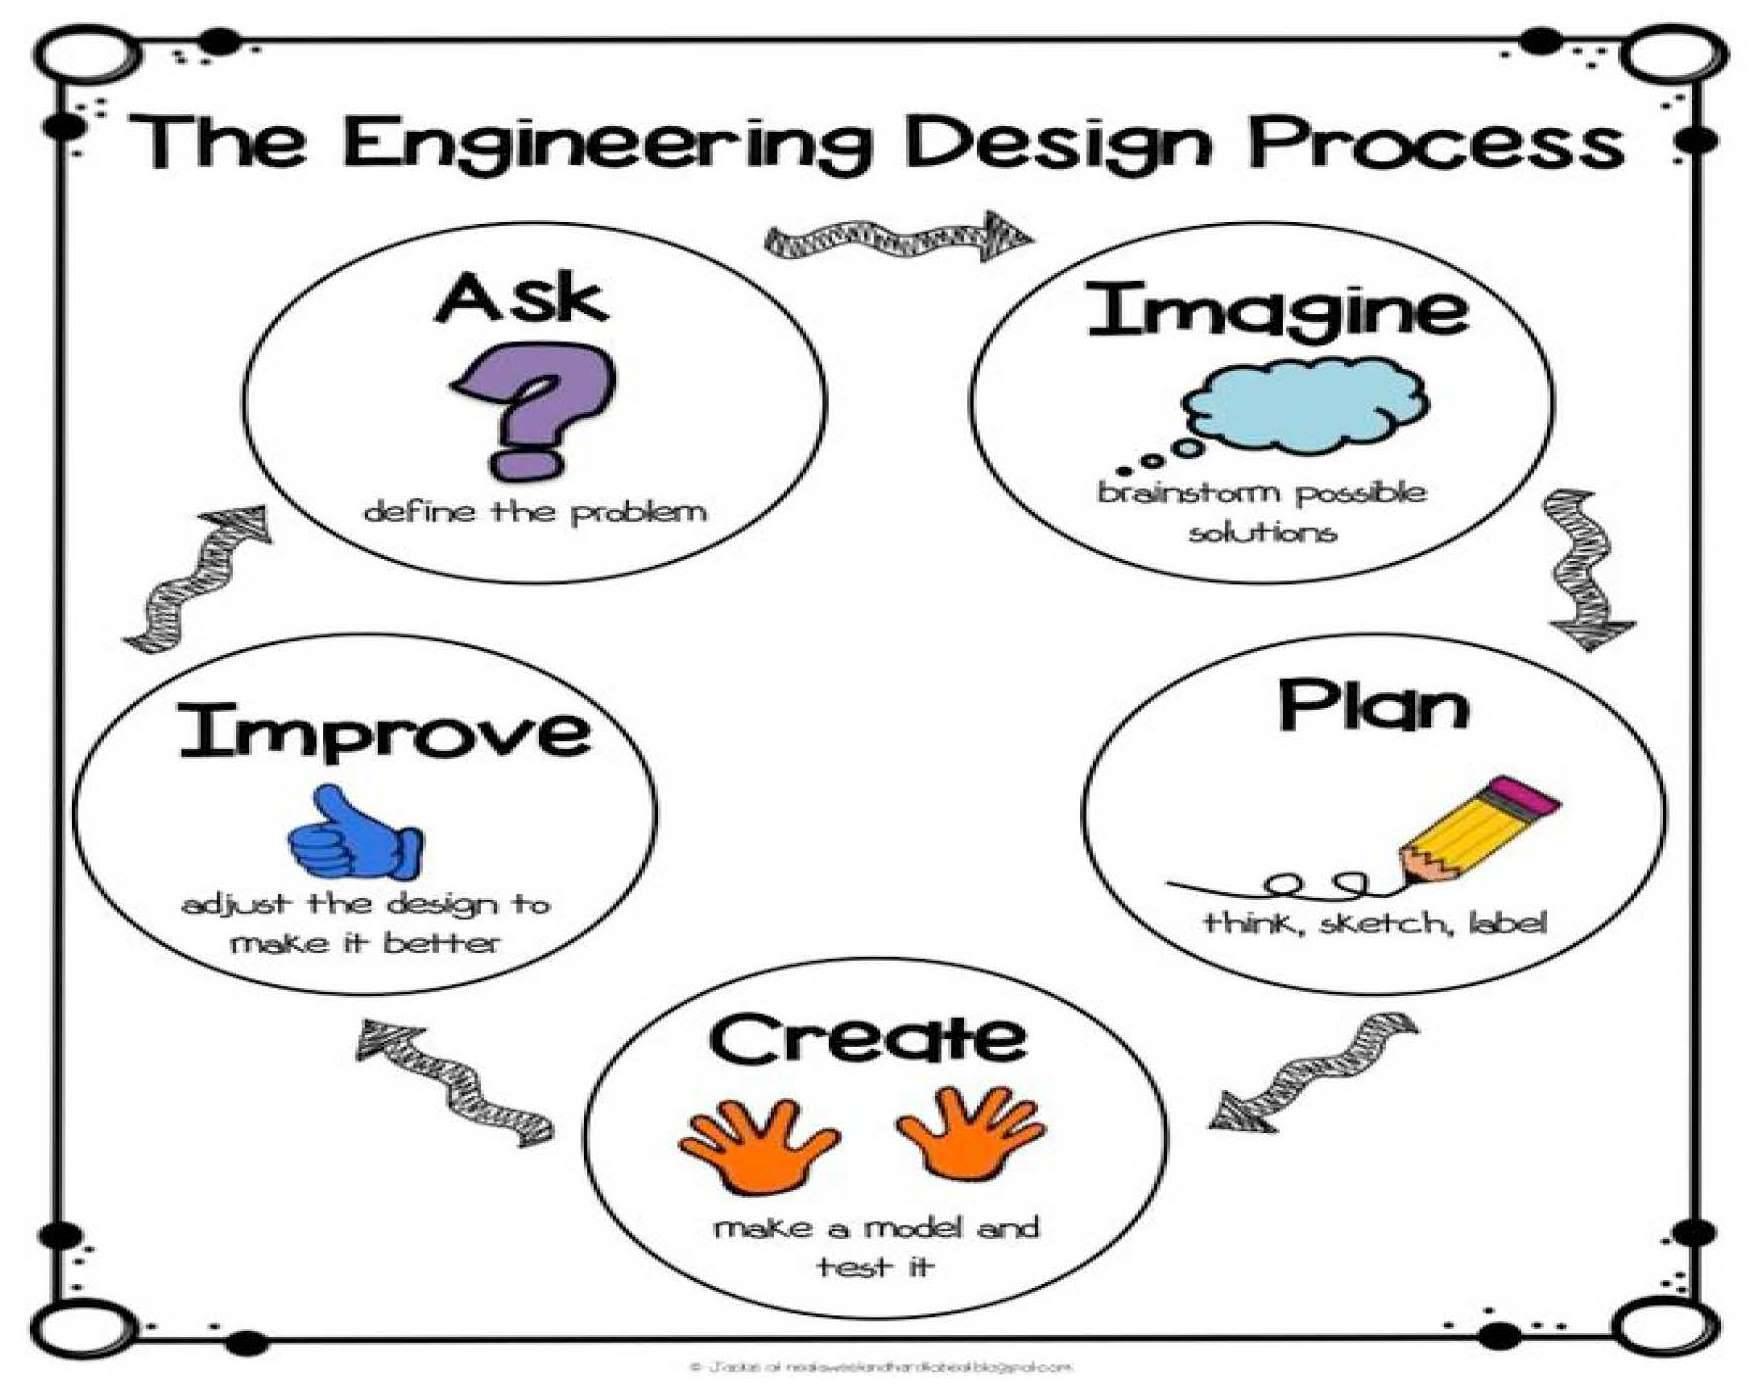 sap r 3 modules diagram human hand skeleton business process integration engine